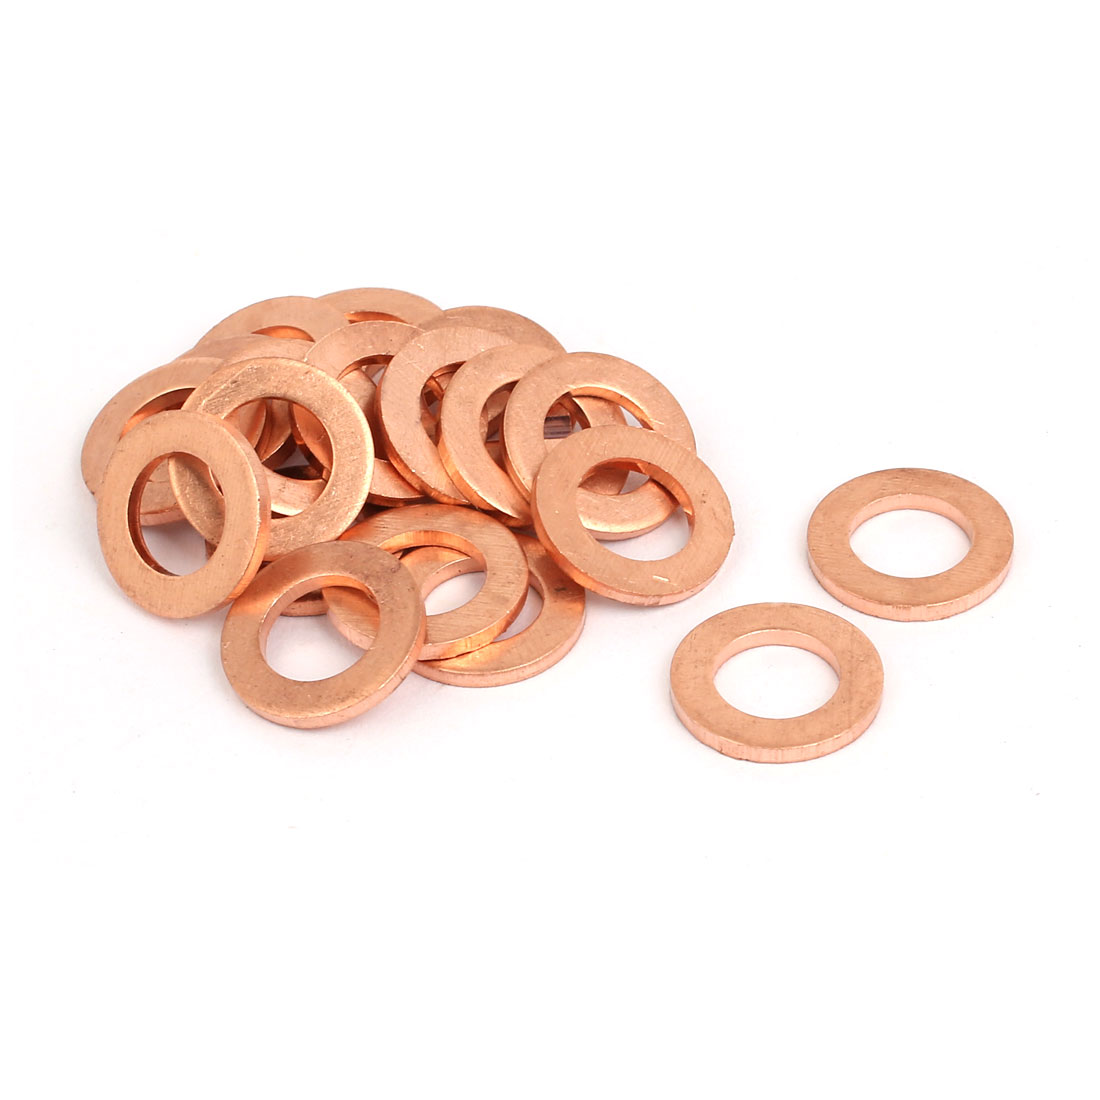 20pcs 8mmx14mmx1.5mm Copper Flat Ring Sealing Crush Washer Gasket